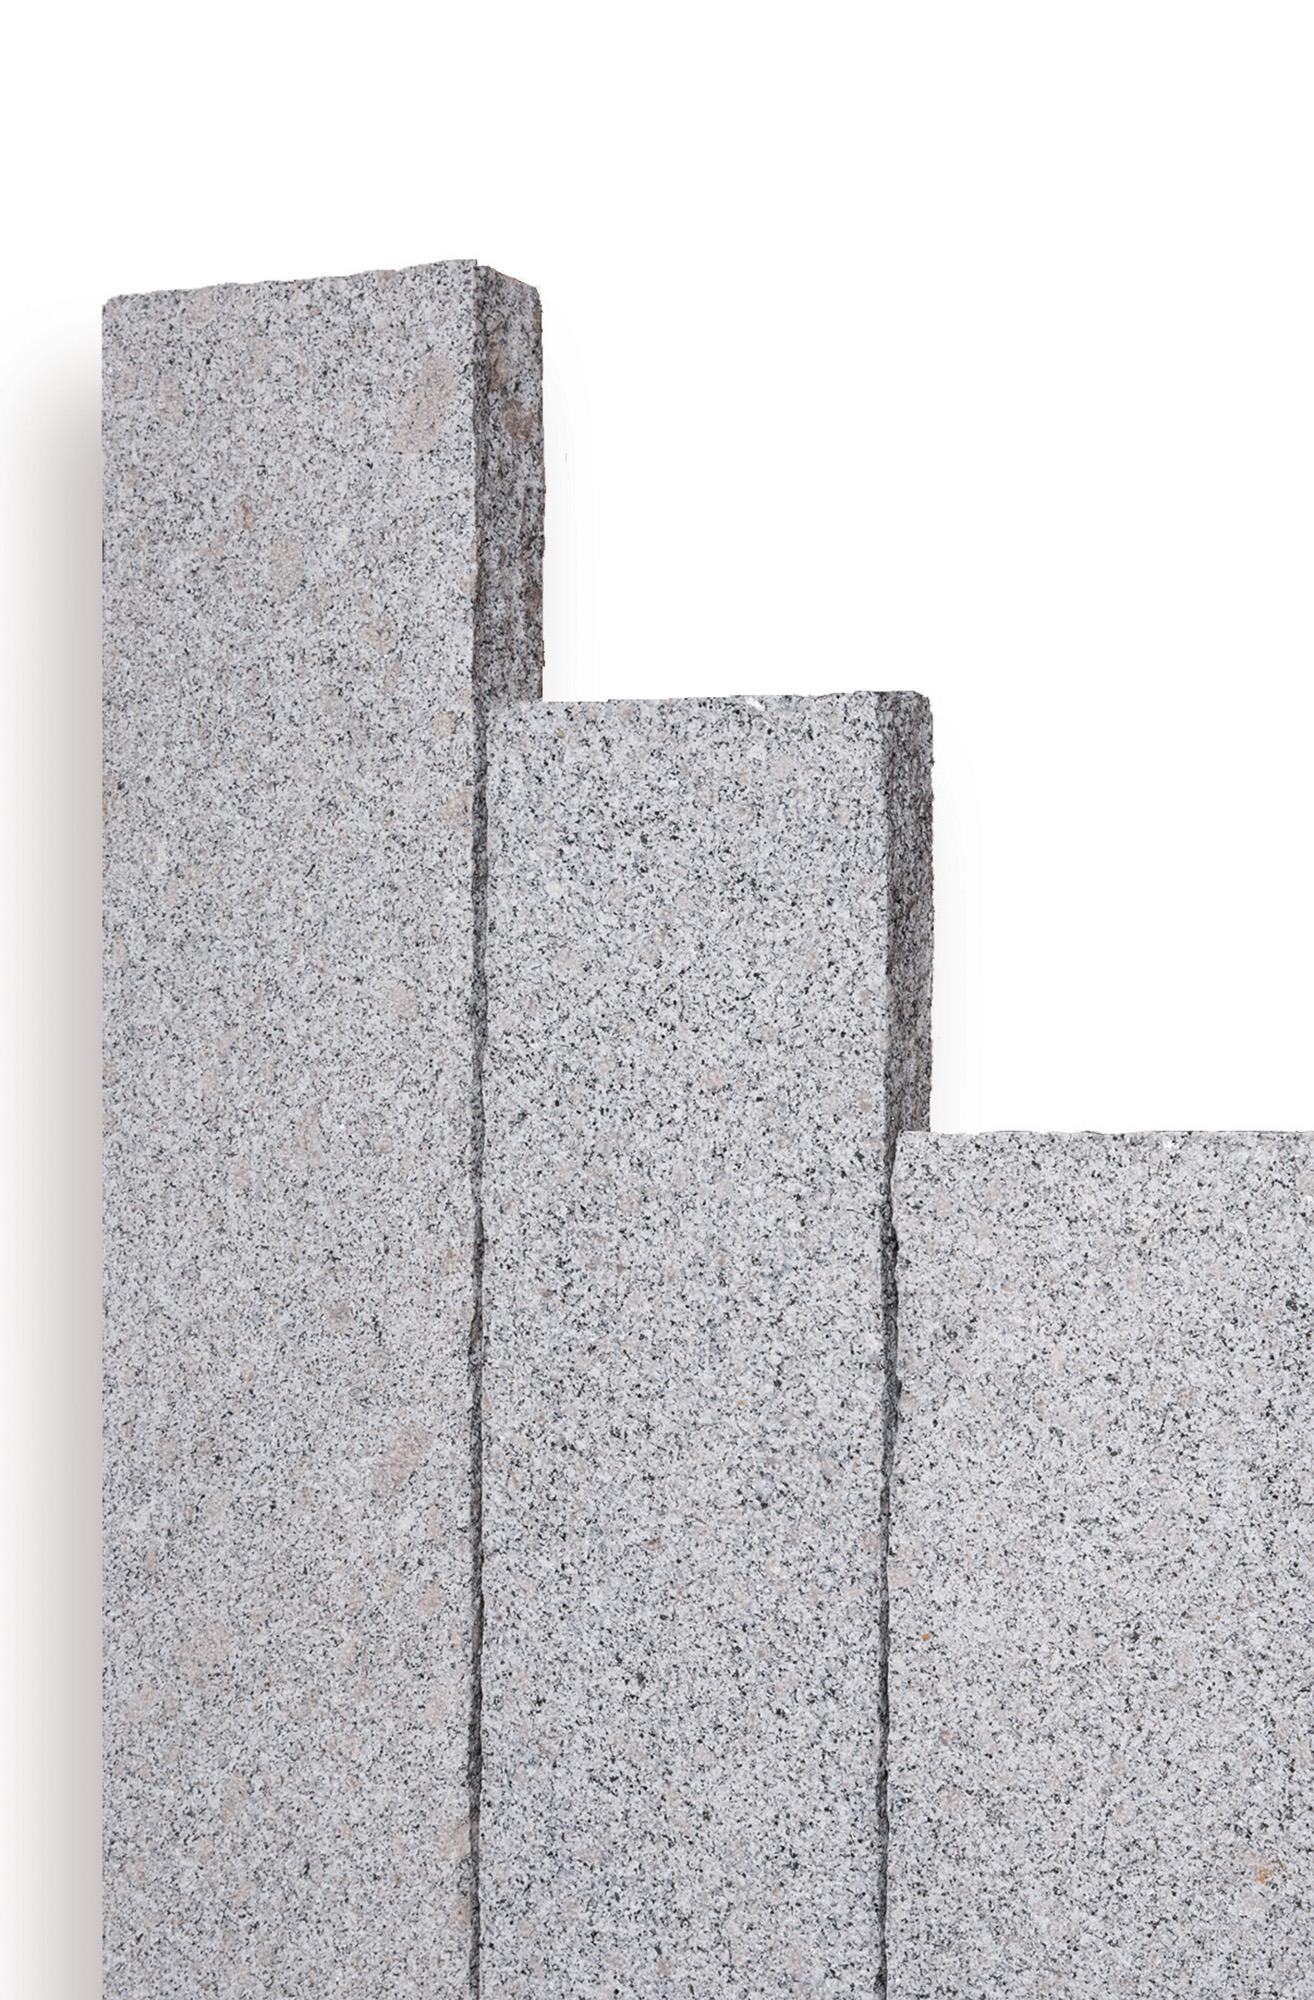 Palisade Randstein Premium Granit hellgrau 10x25x150cm gestockte Oberkante